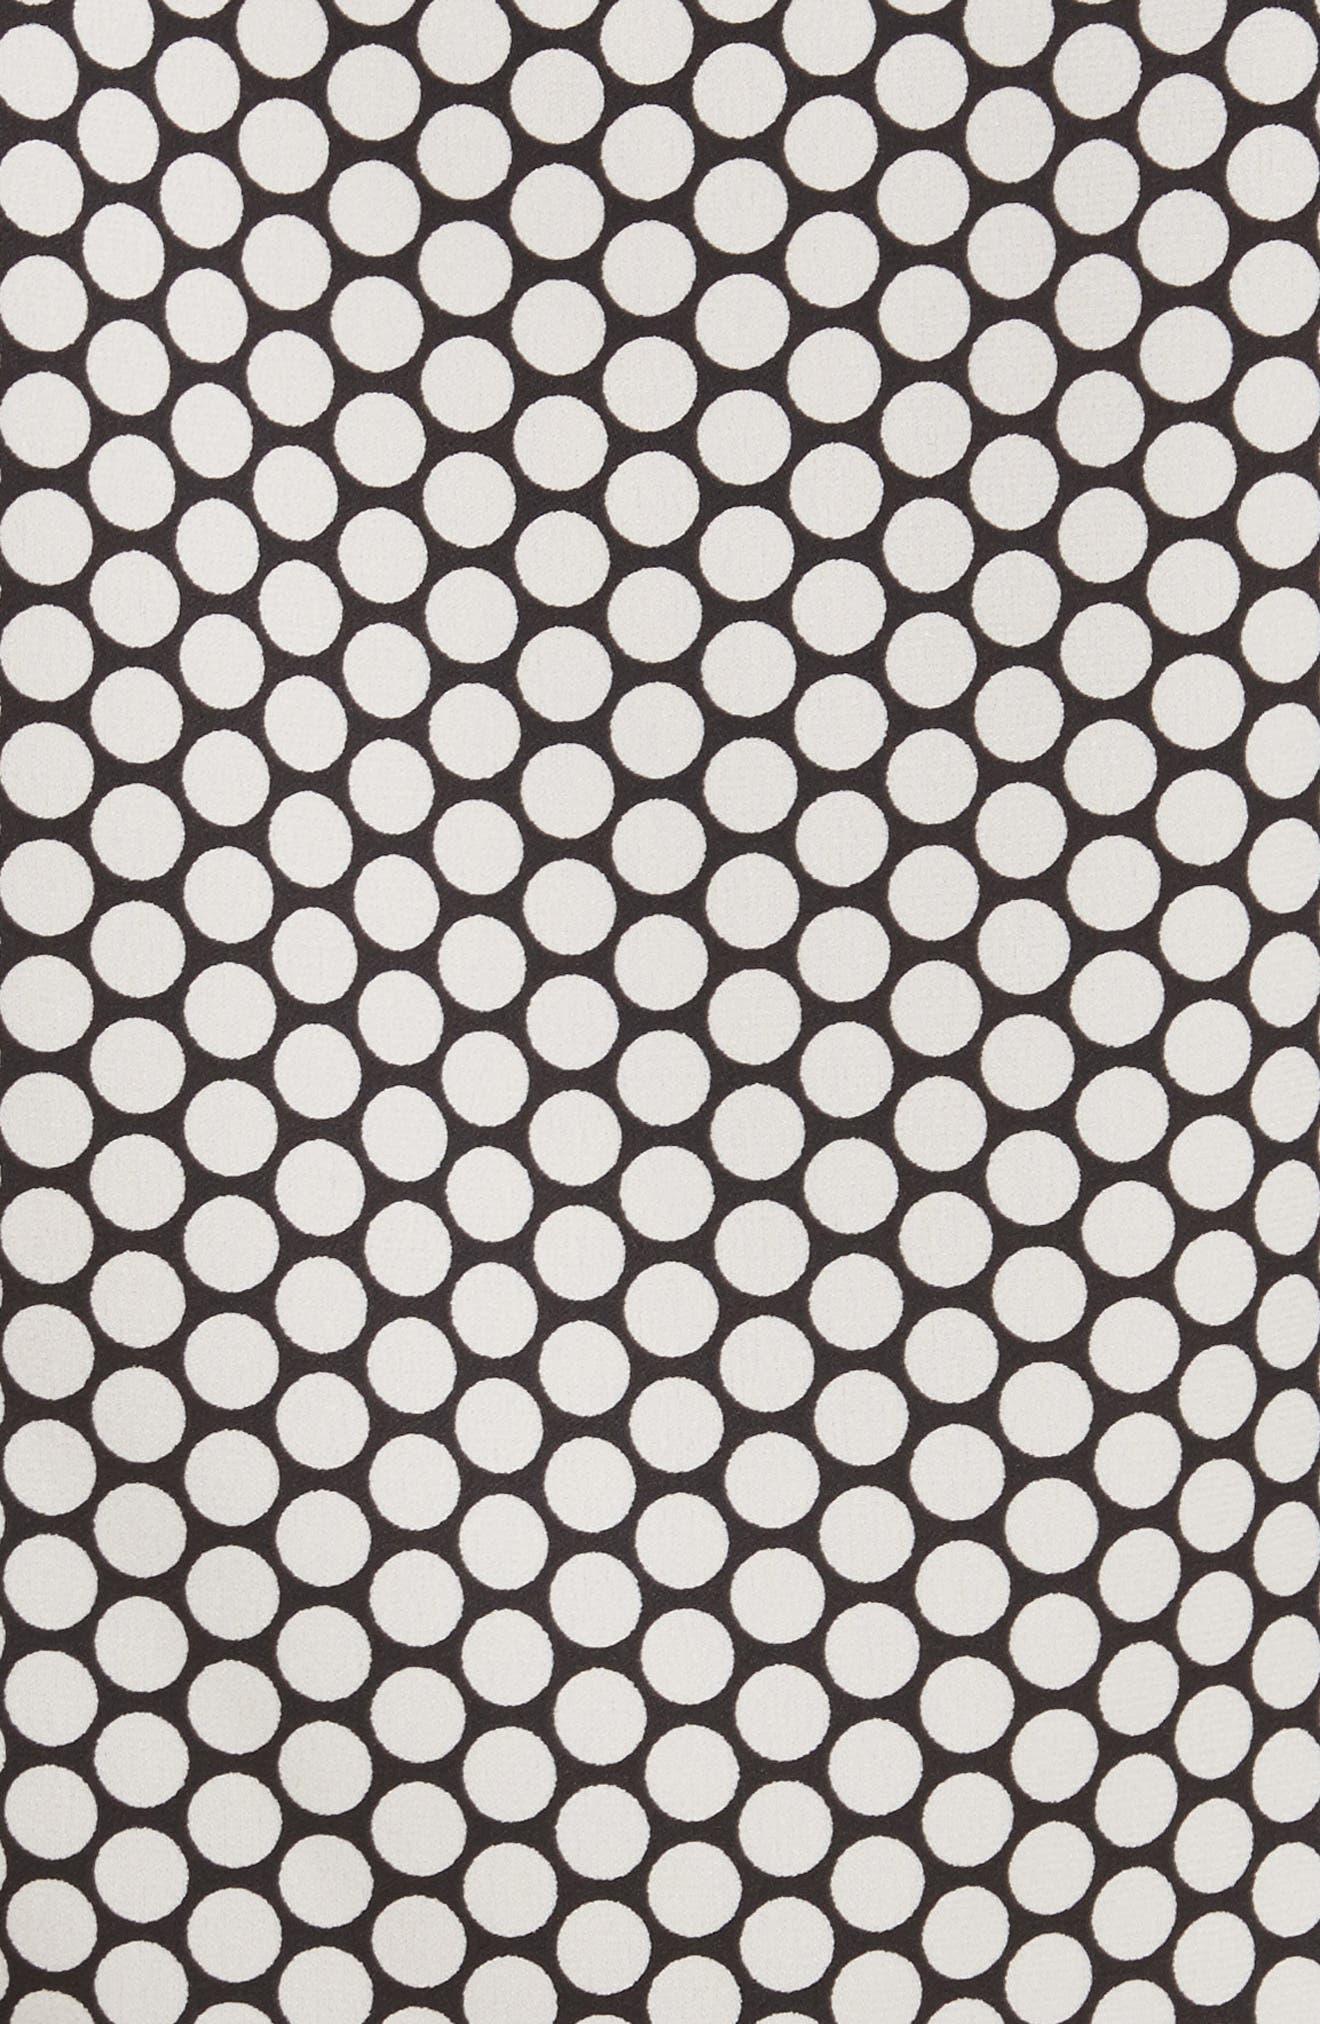 Diane von Furstenberg Stretch Silk Wrap Blouse,                             Alternate thumbnail 5, color,                             105